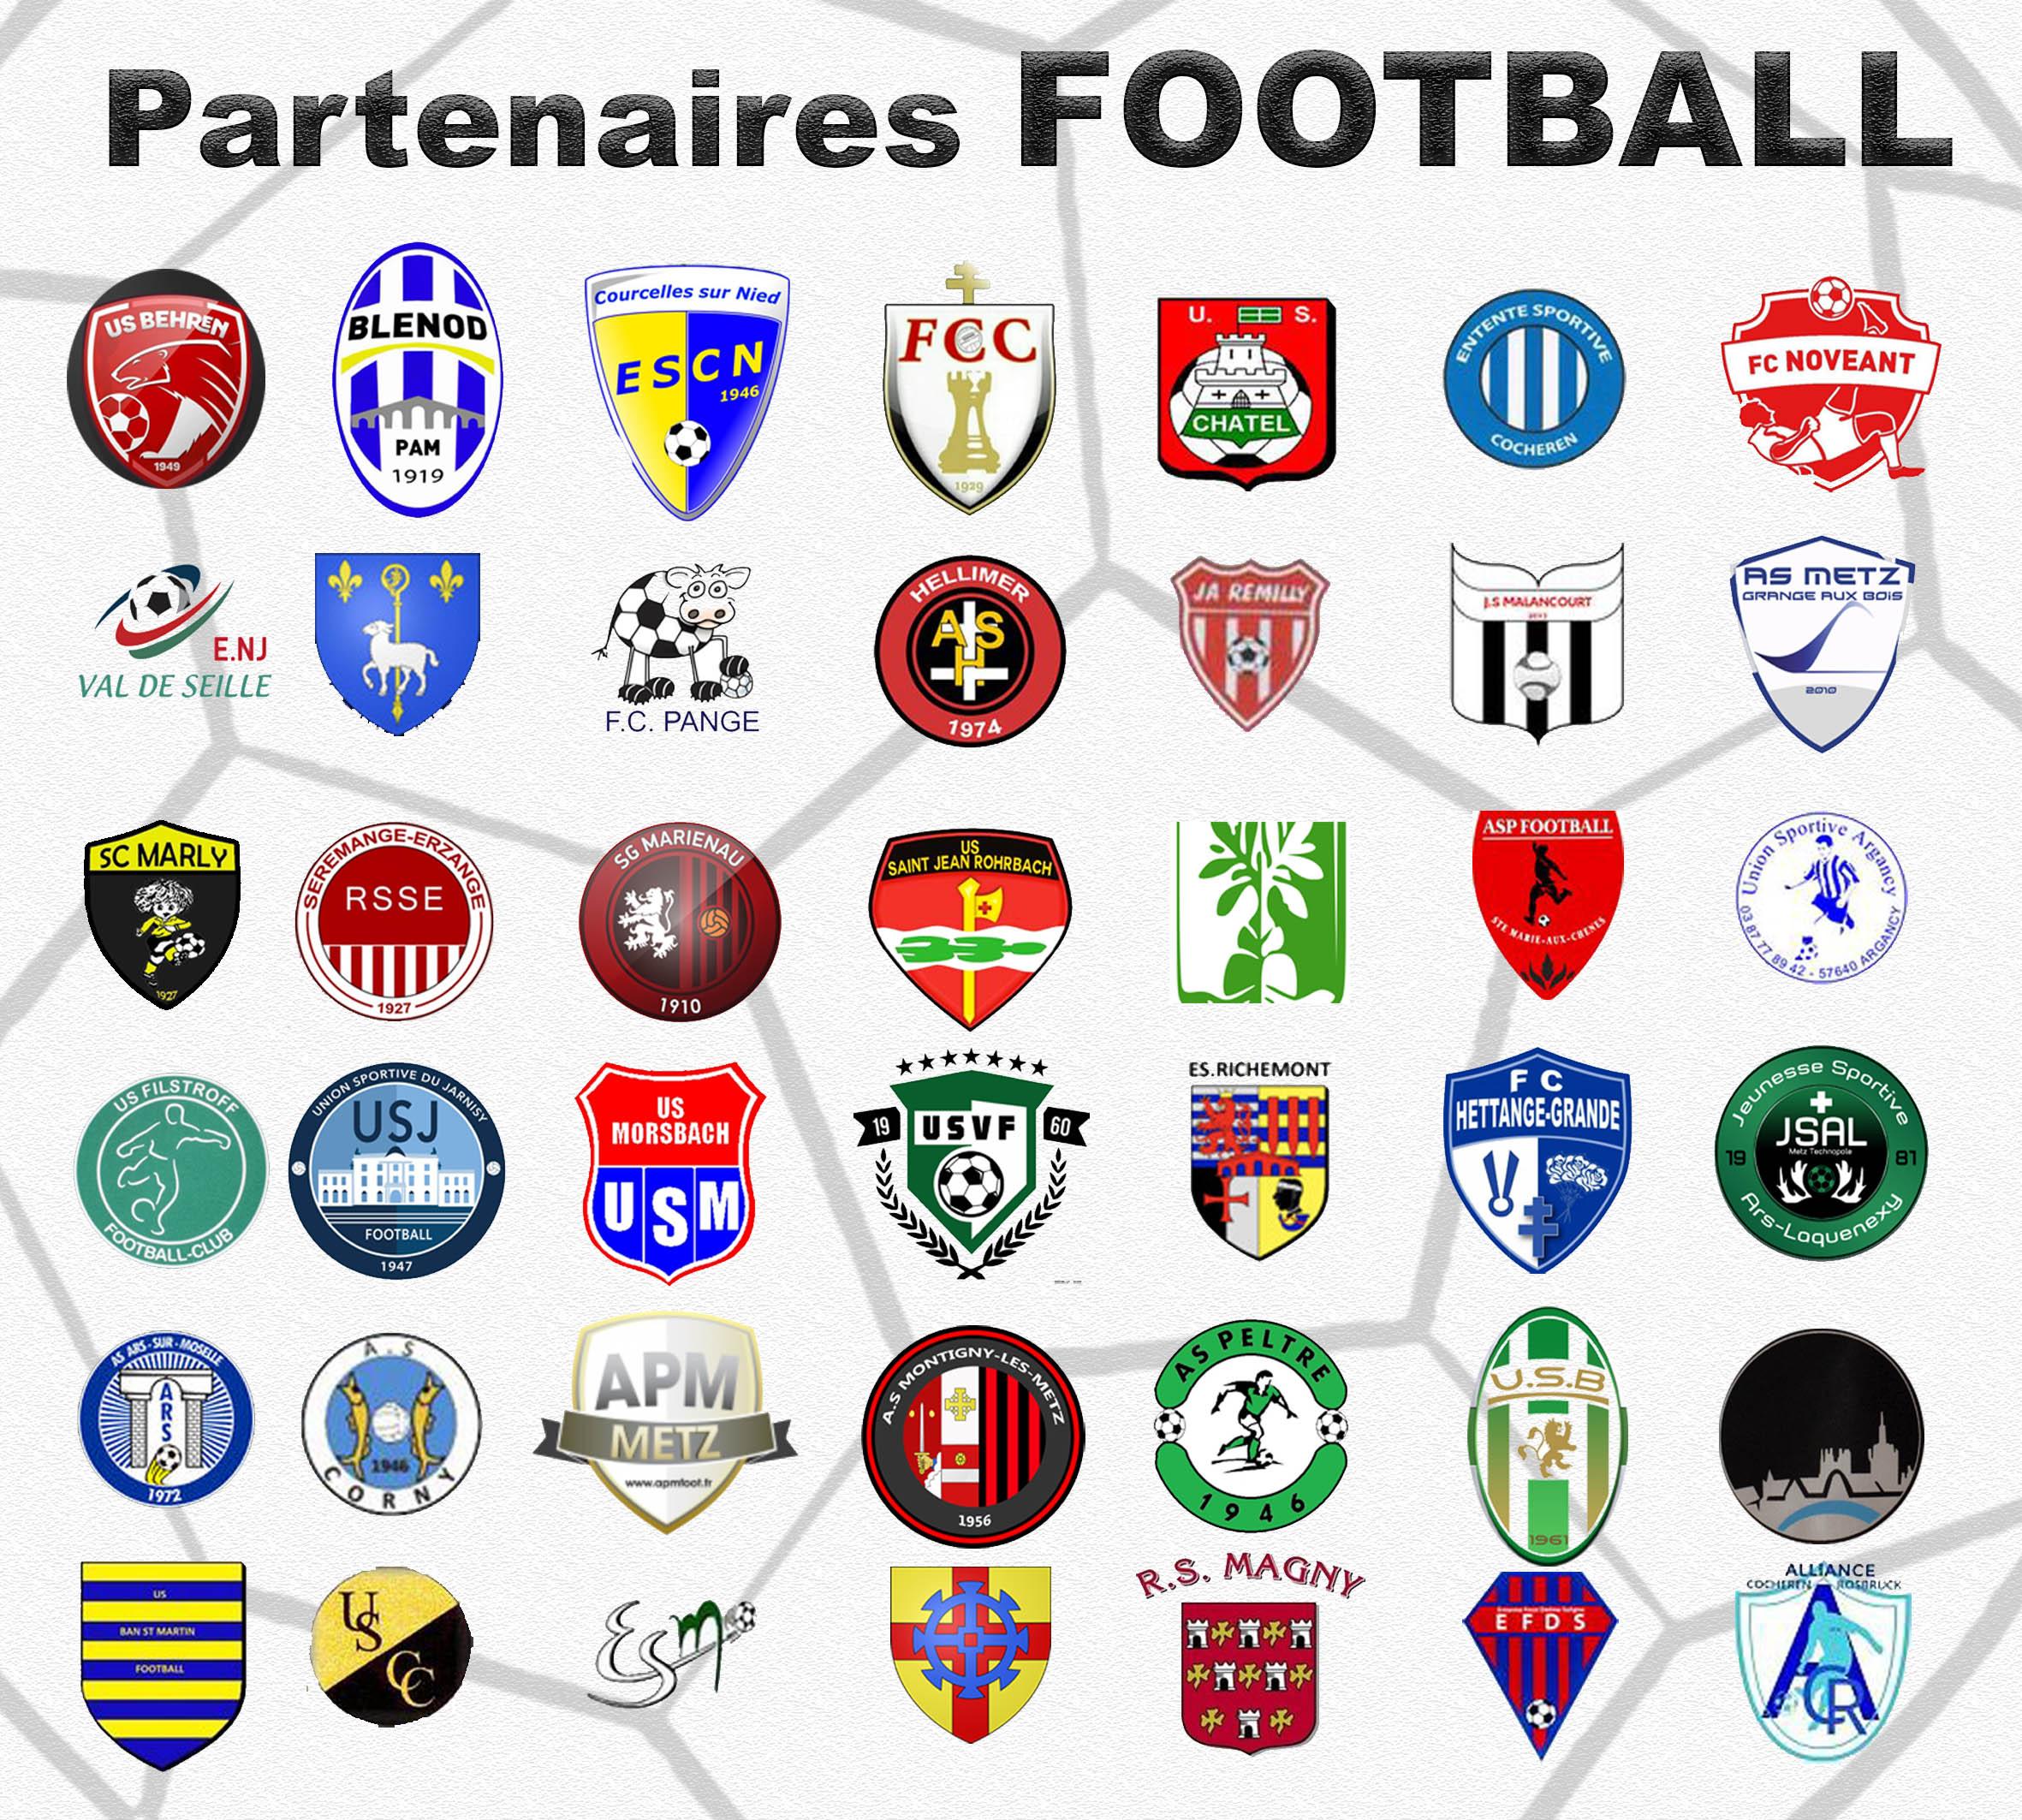 Partenaires football